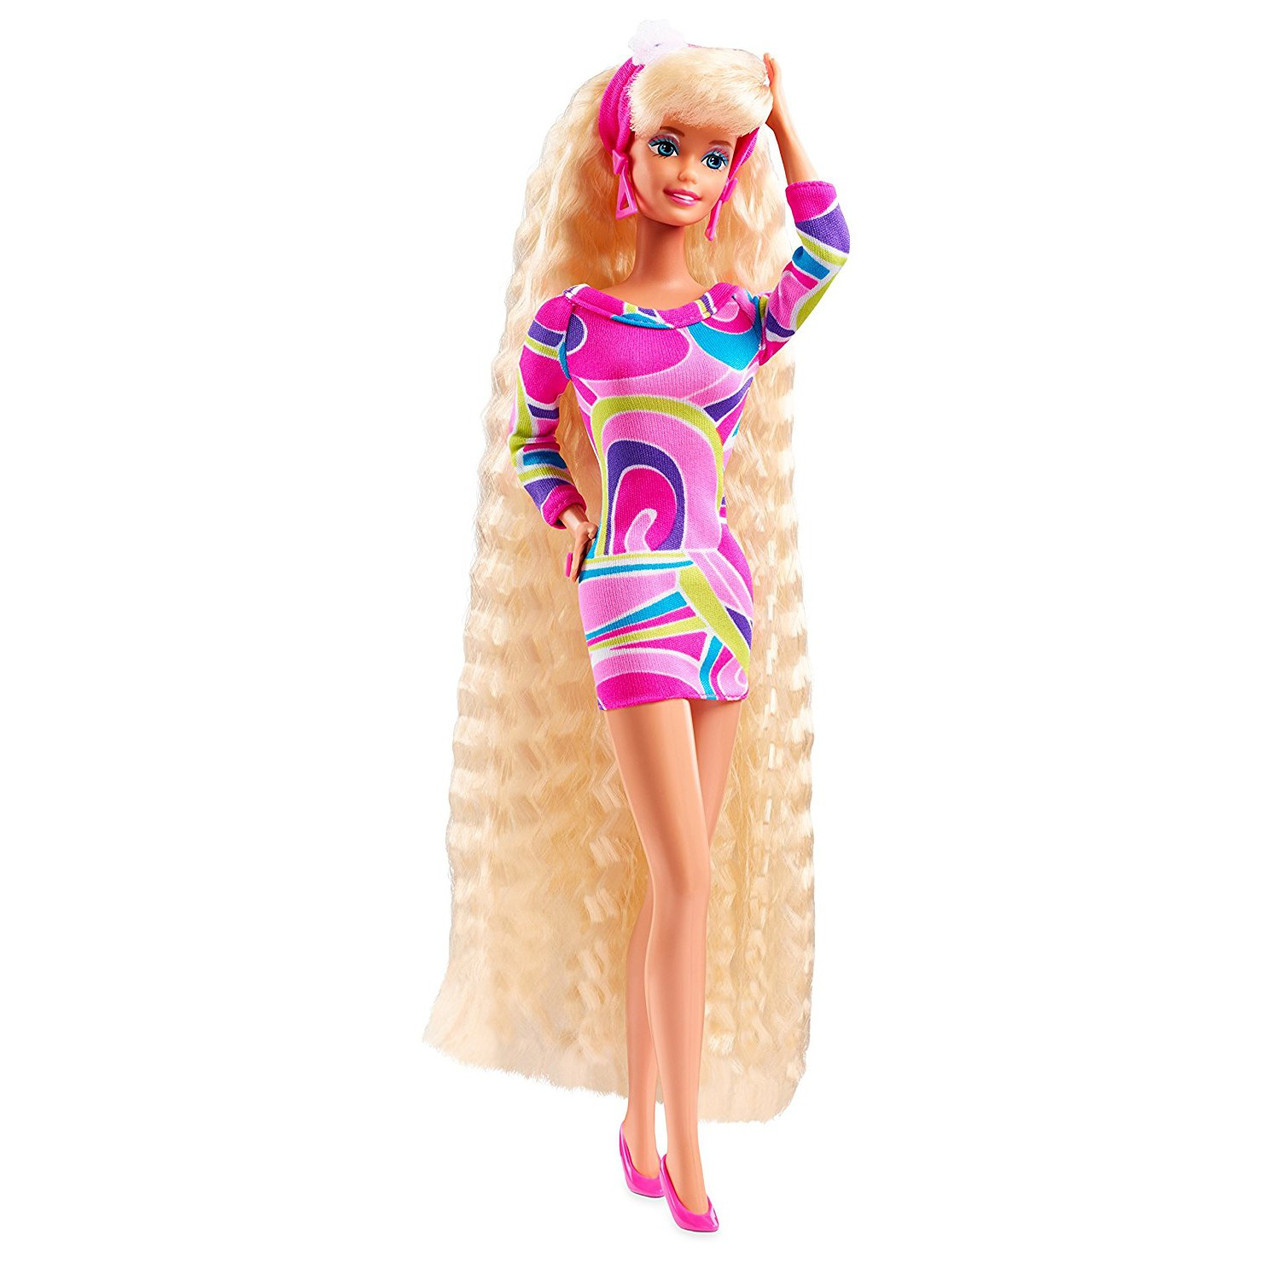 Barbie Коллекционная кукла Барби, Totally Hair